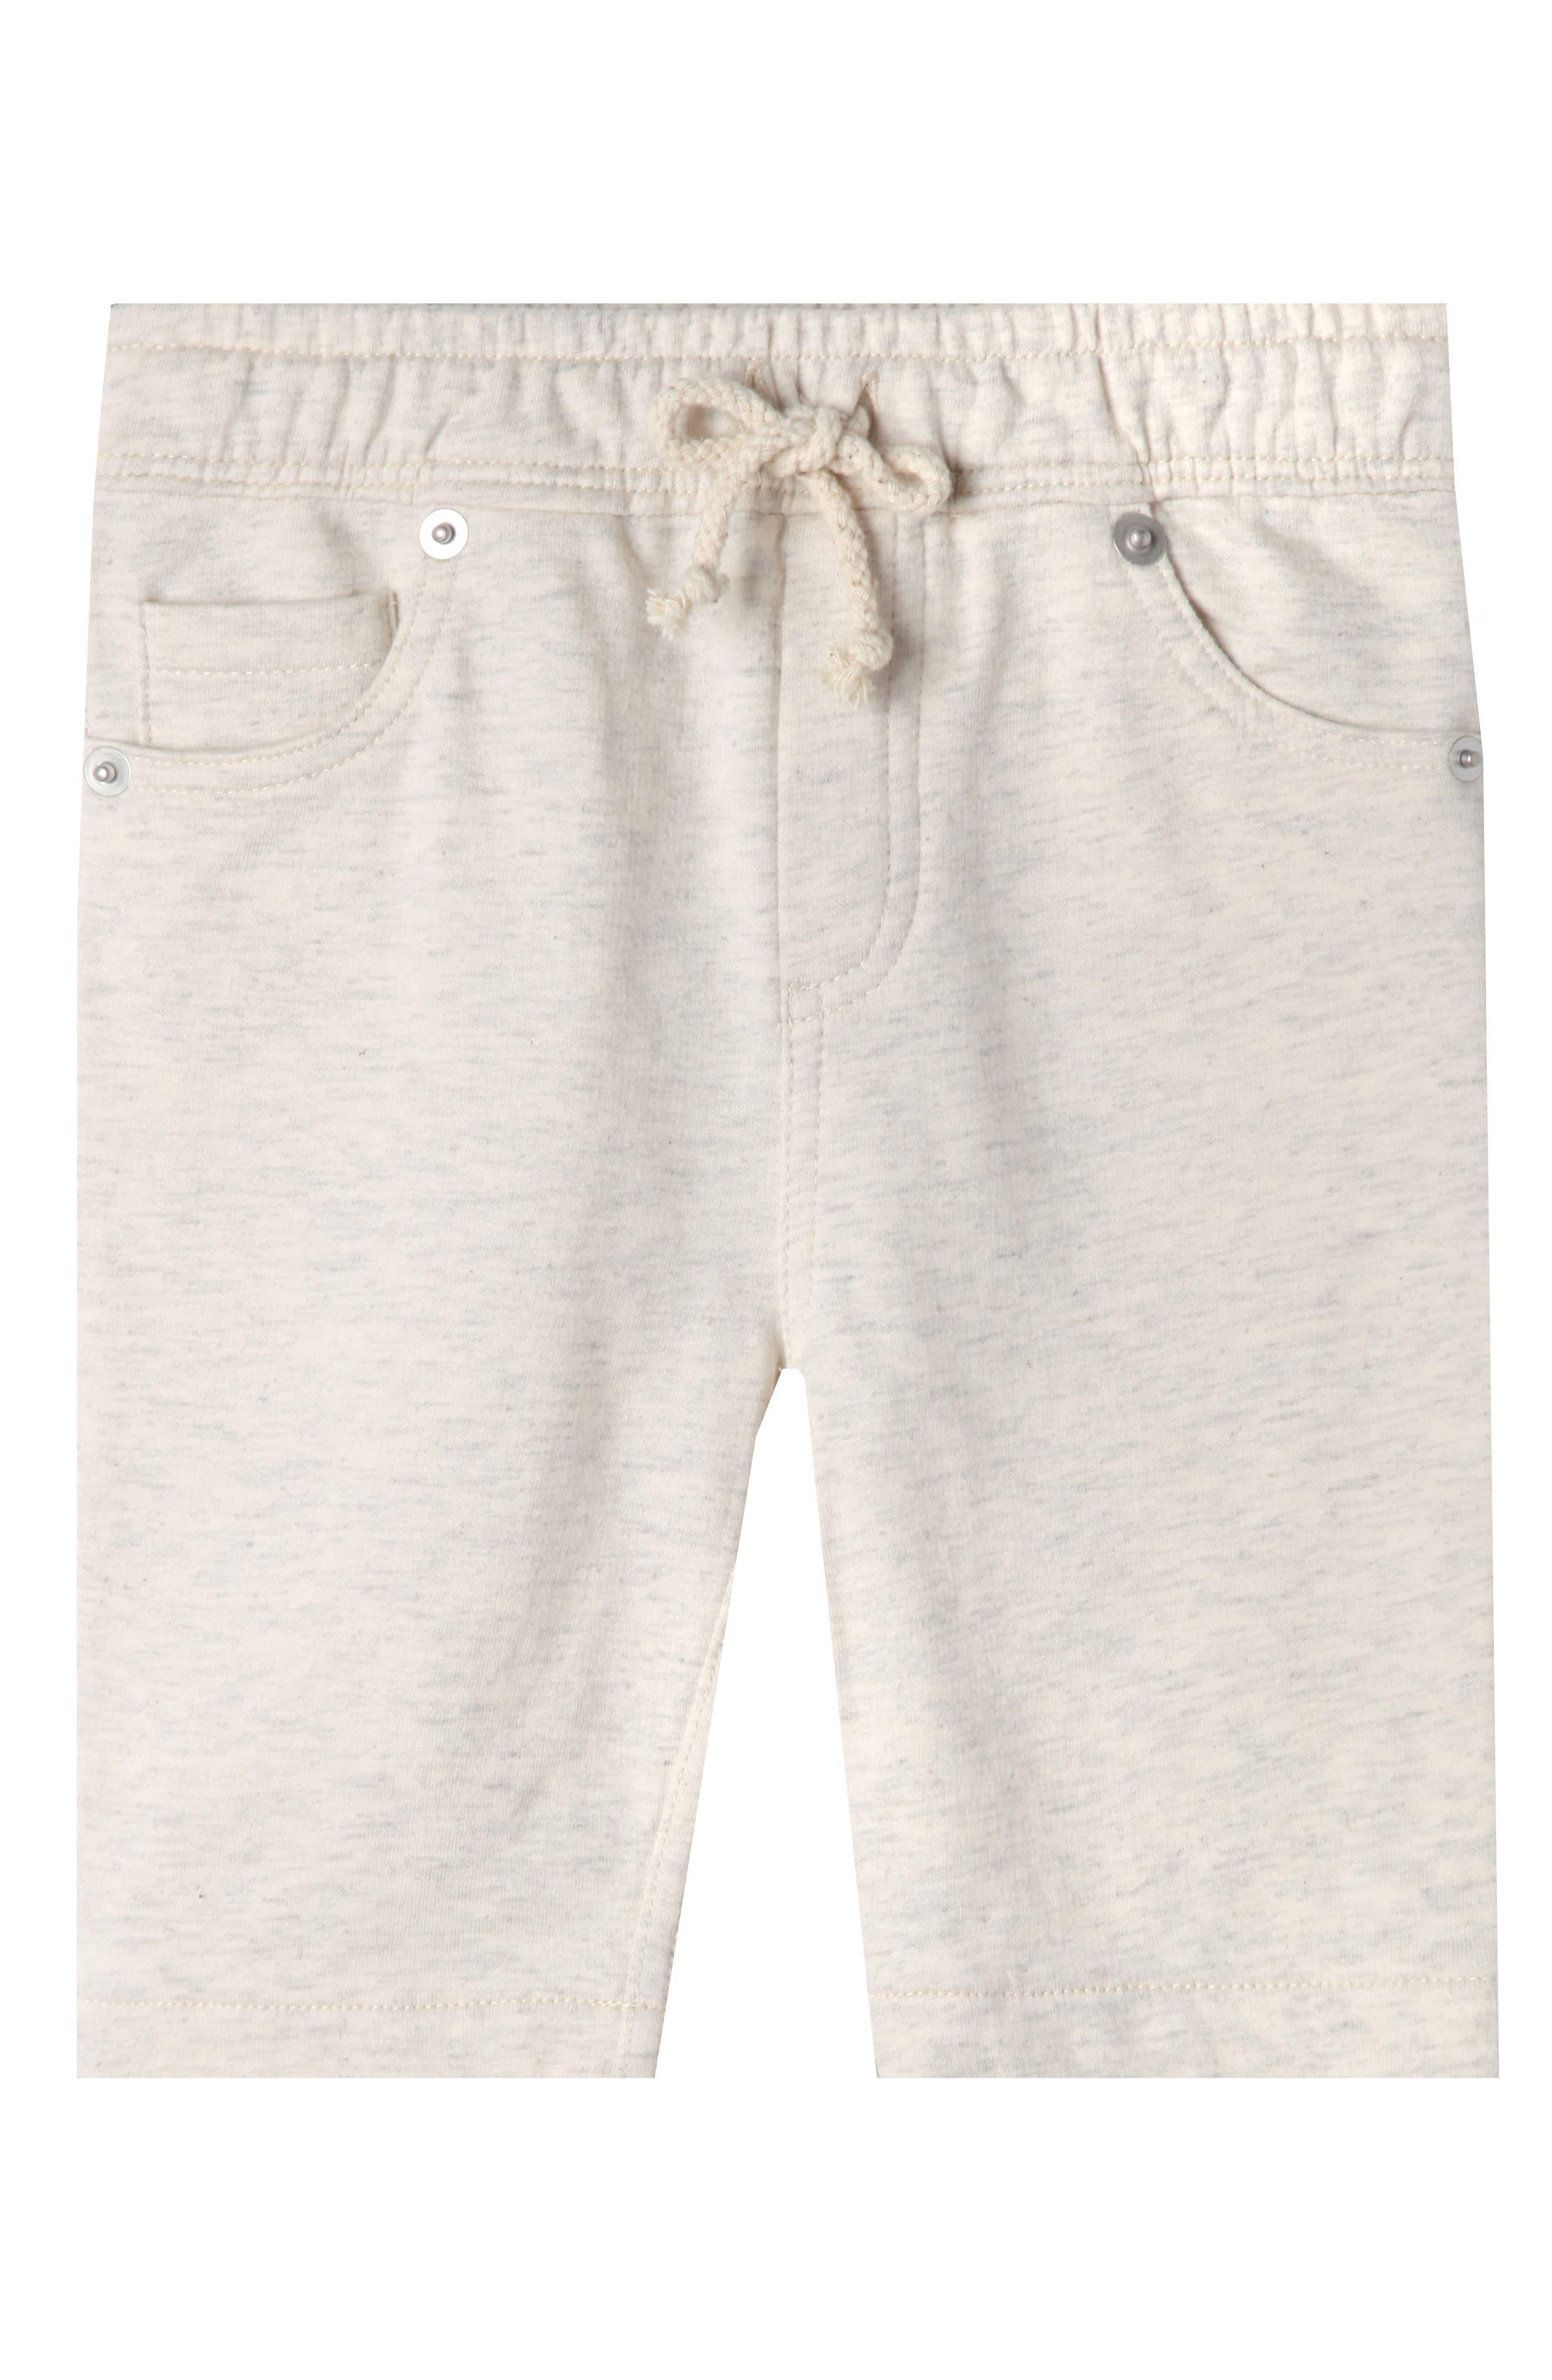 Luke Organic Cotton Shorts,                         Main,                         color, OATMEAL HEATHER